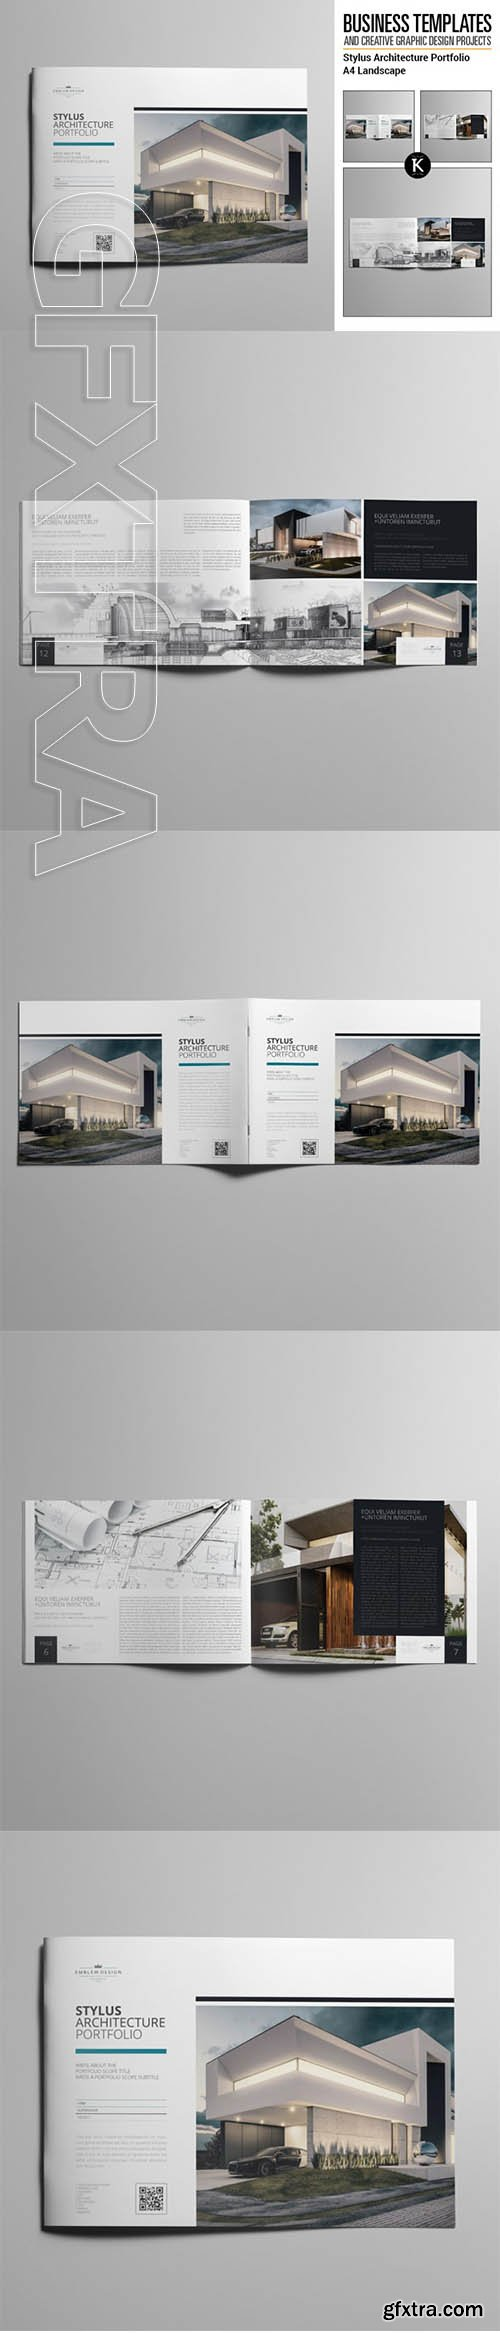 keboto - Stylus Architecture Portfolio A4 Landscape